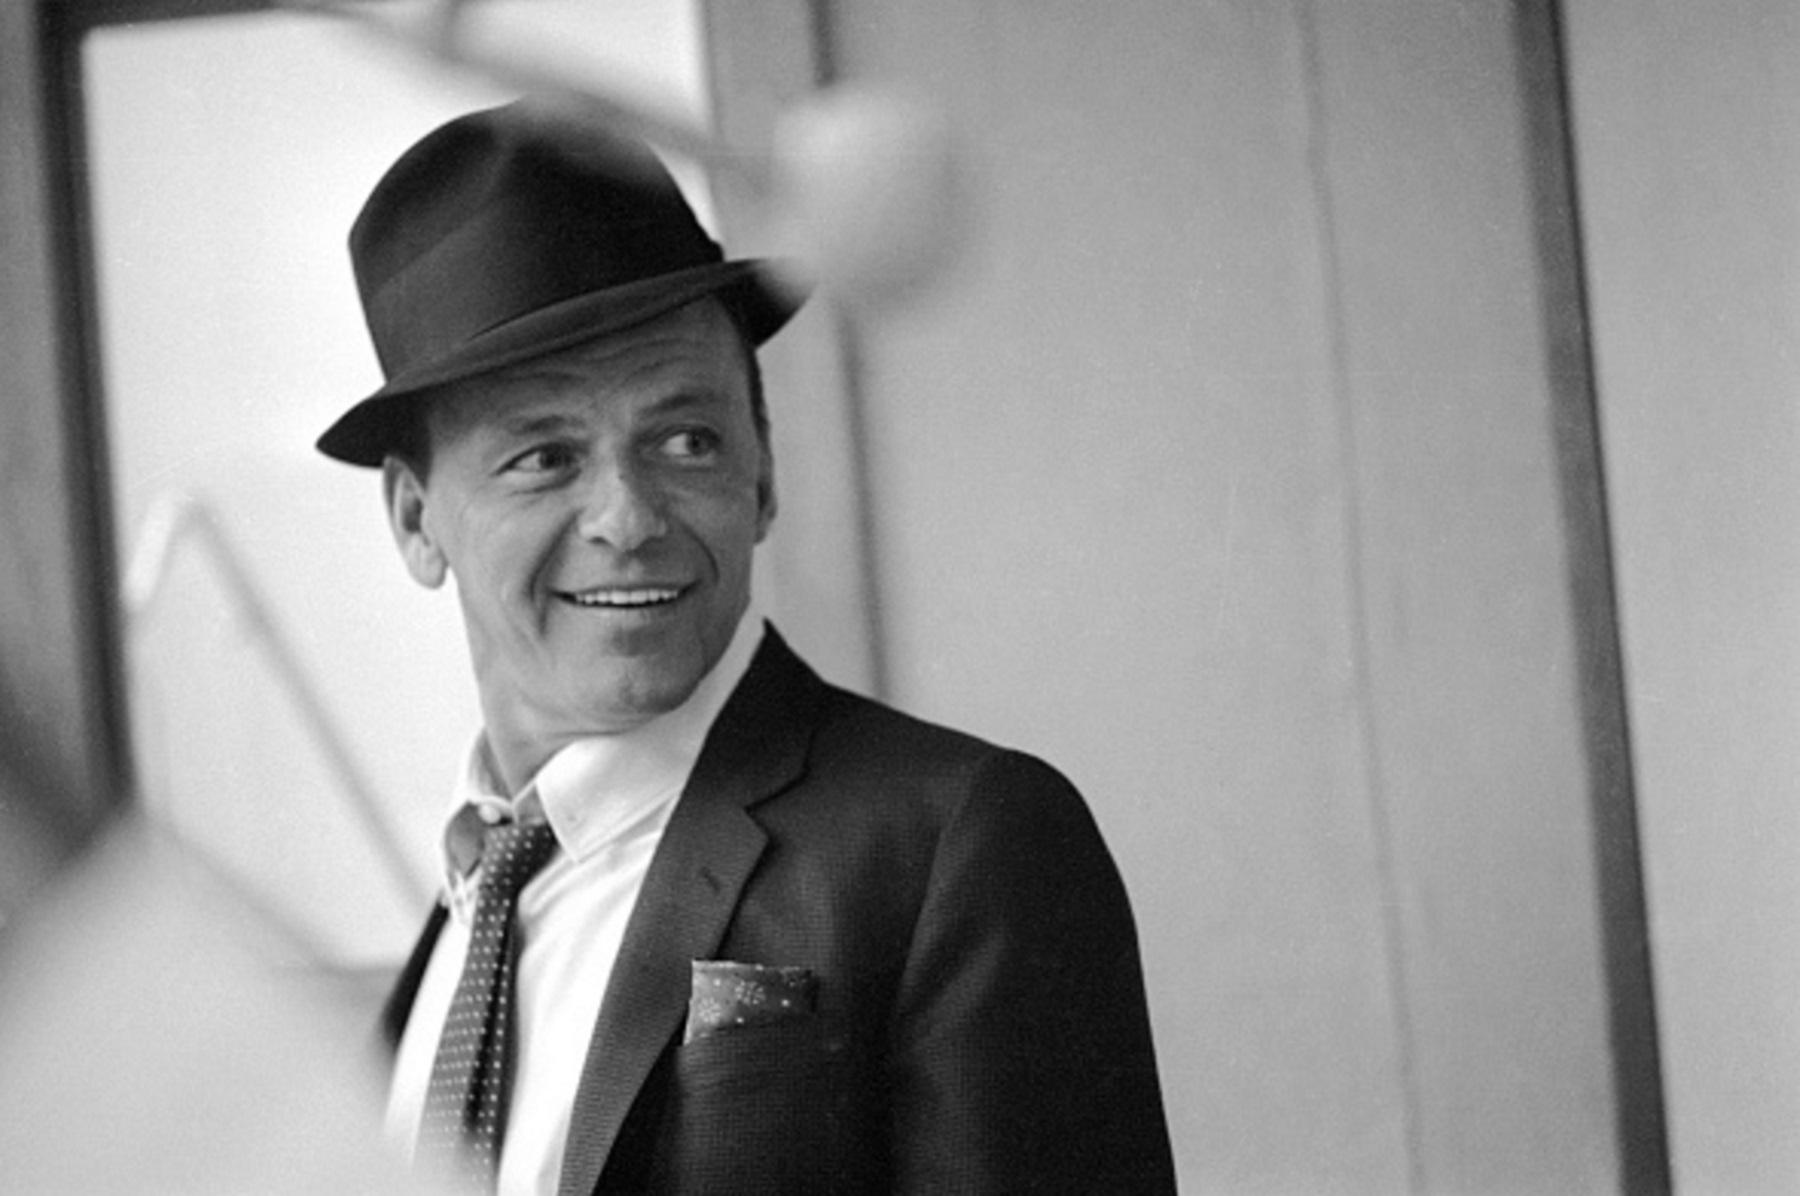 Frank Sinatra Harry Connick Jr. MeToo